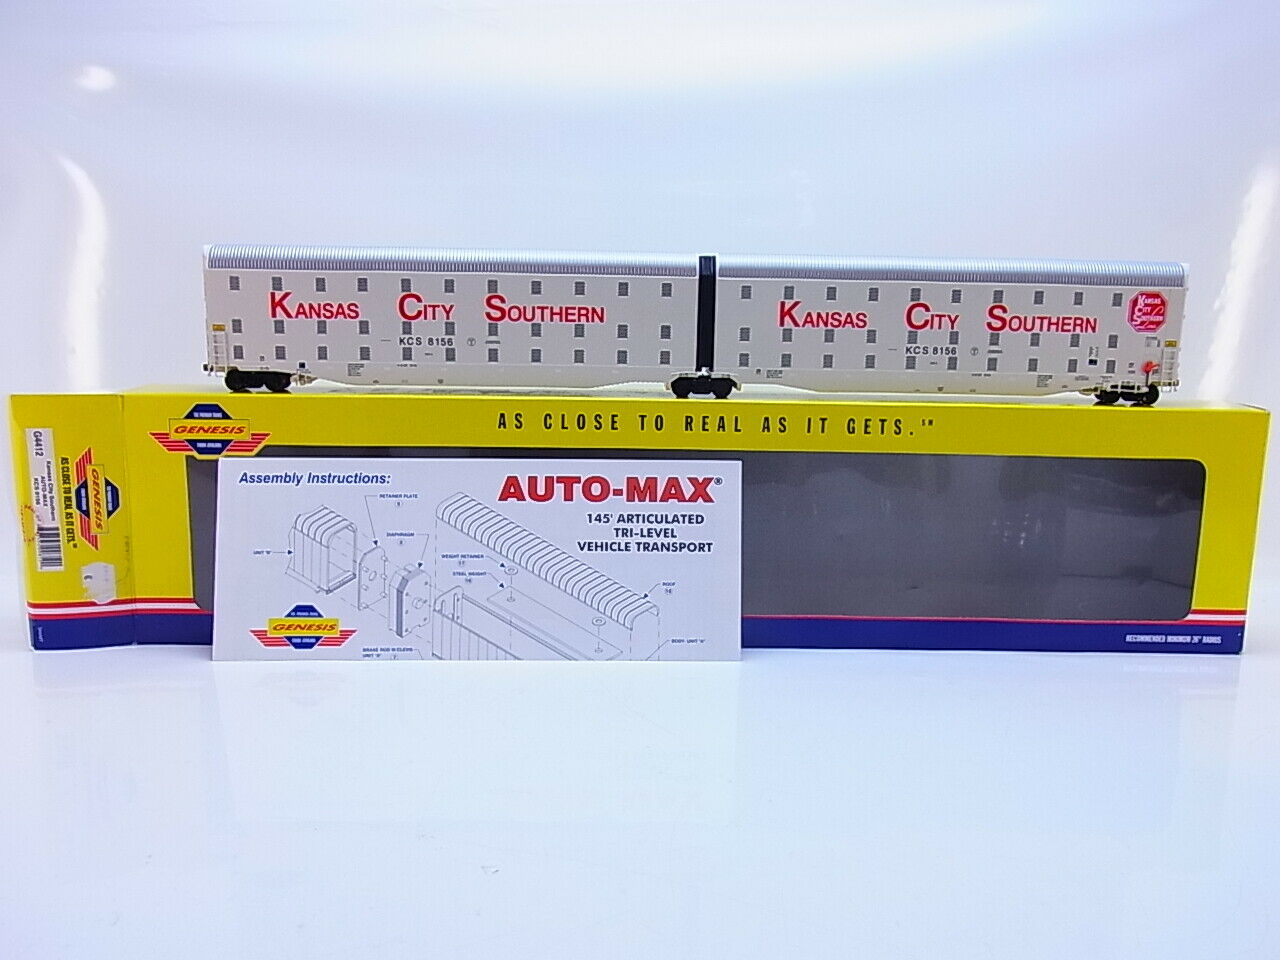 55116 Neuwertiger Atearn Genesis H0 G4412 Kansas City bil -Max KCS 8156 i OVP